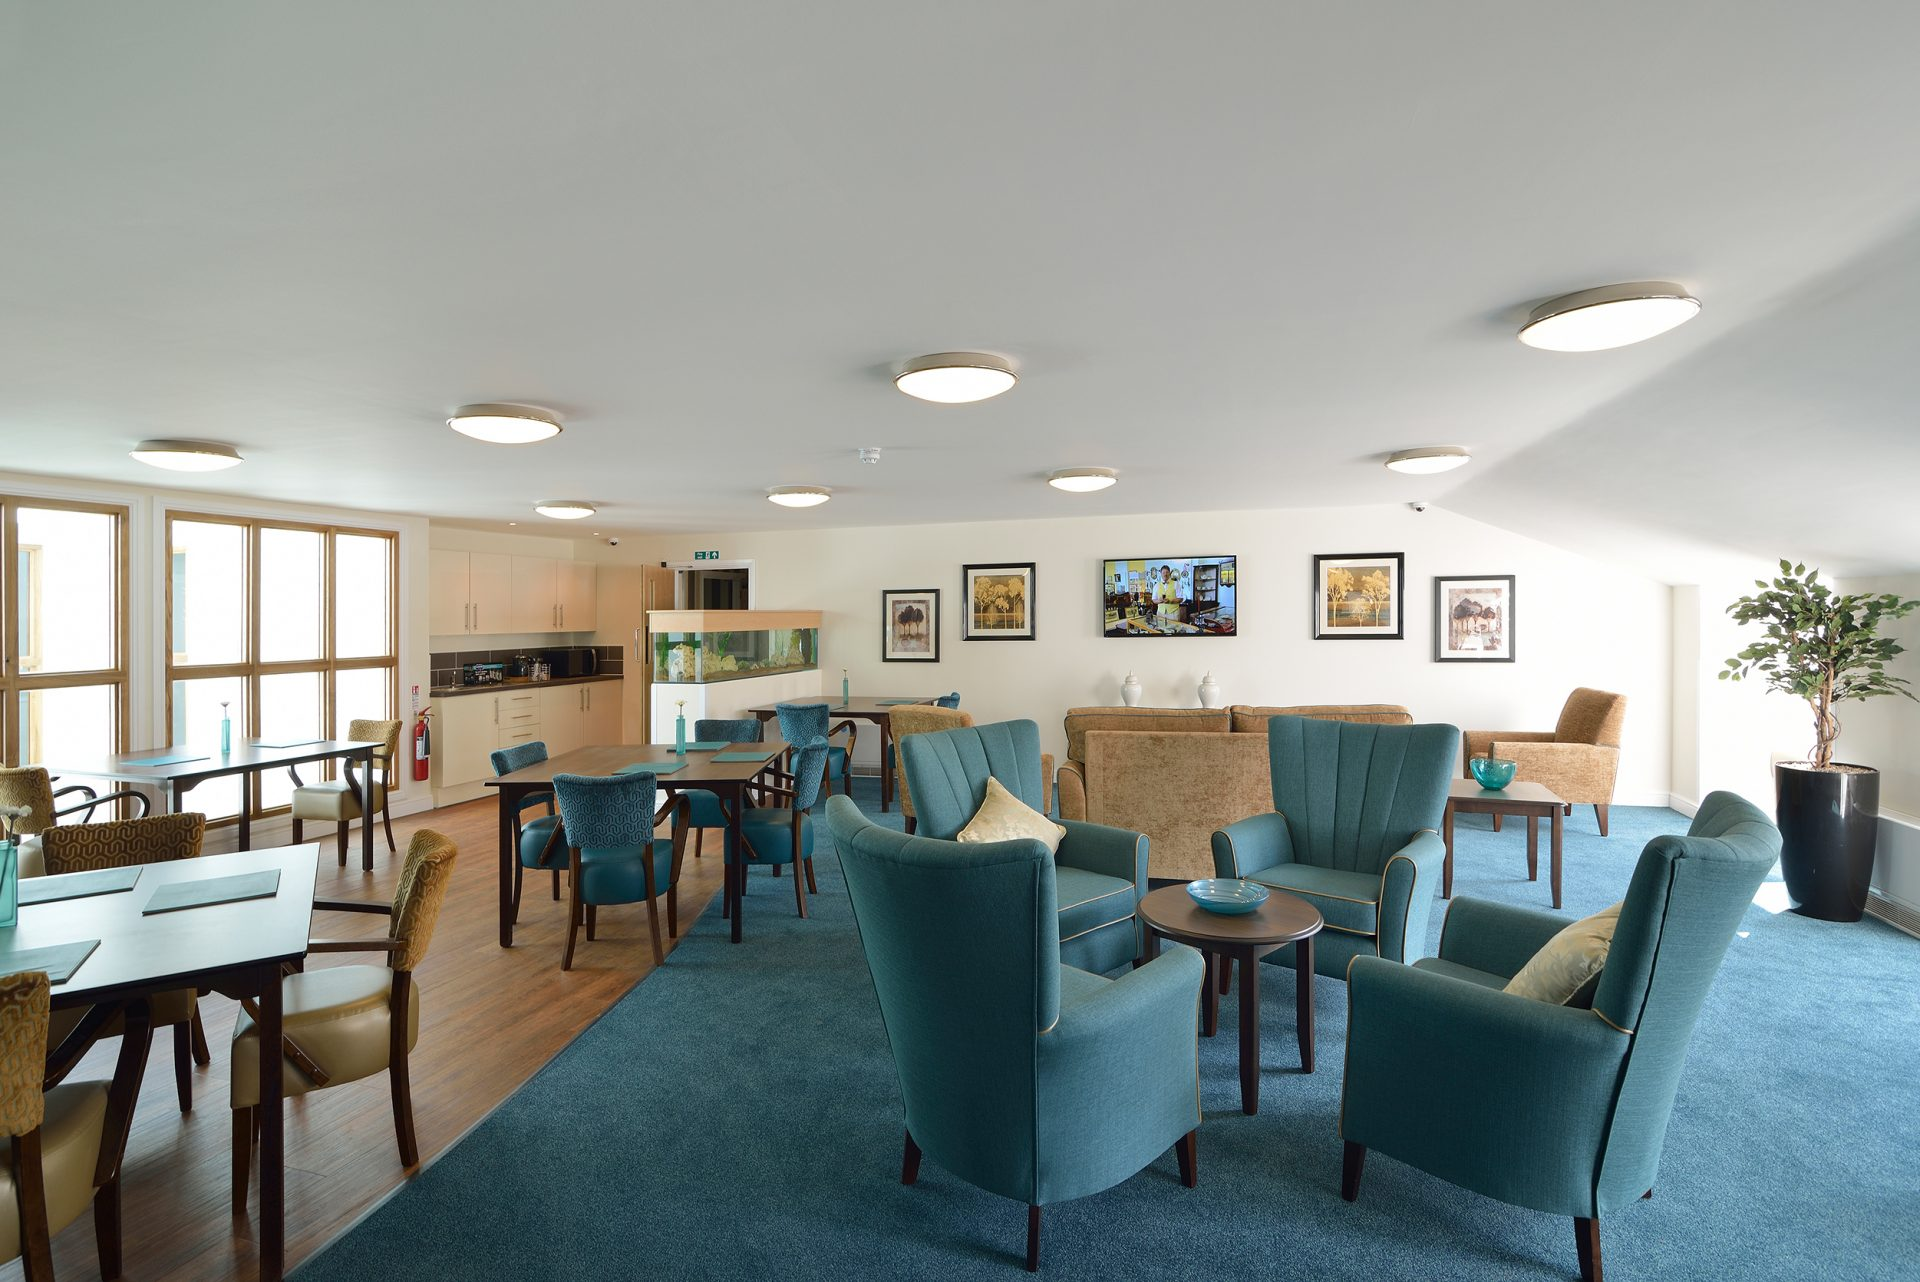 The Laurels Nursing Home. New extension